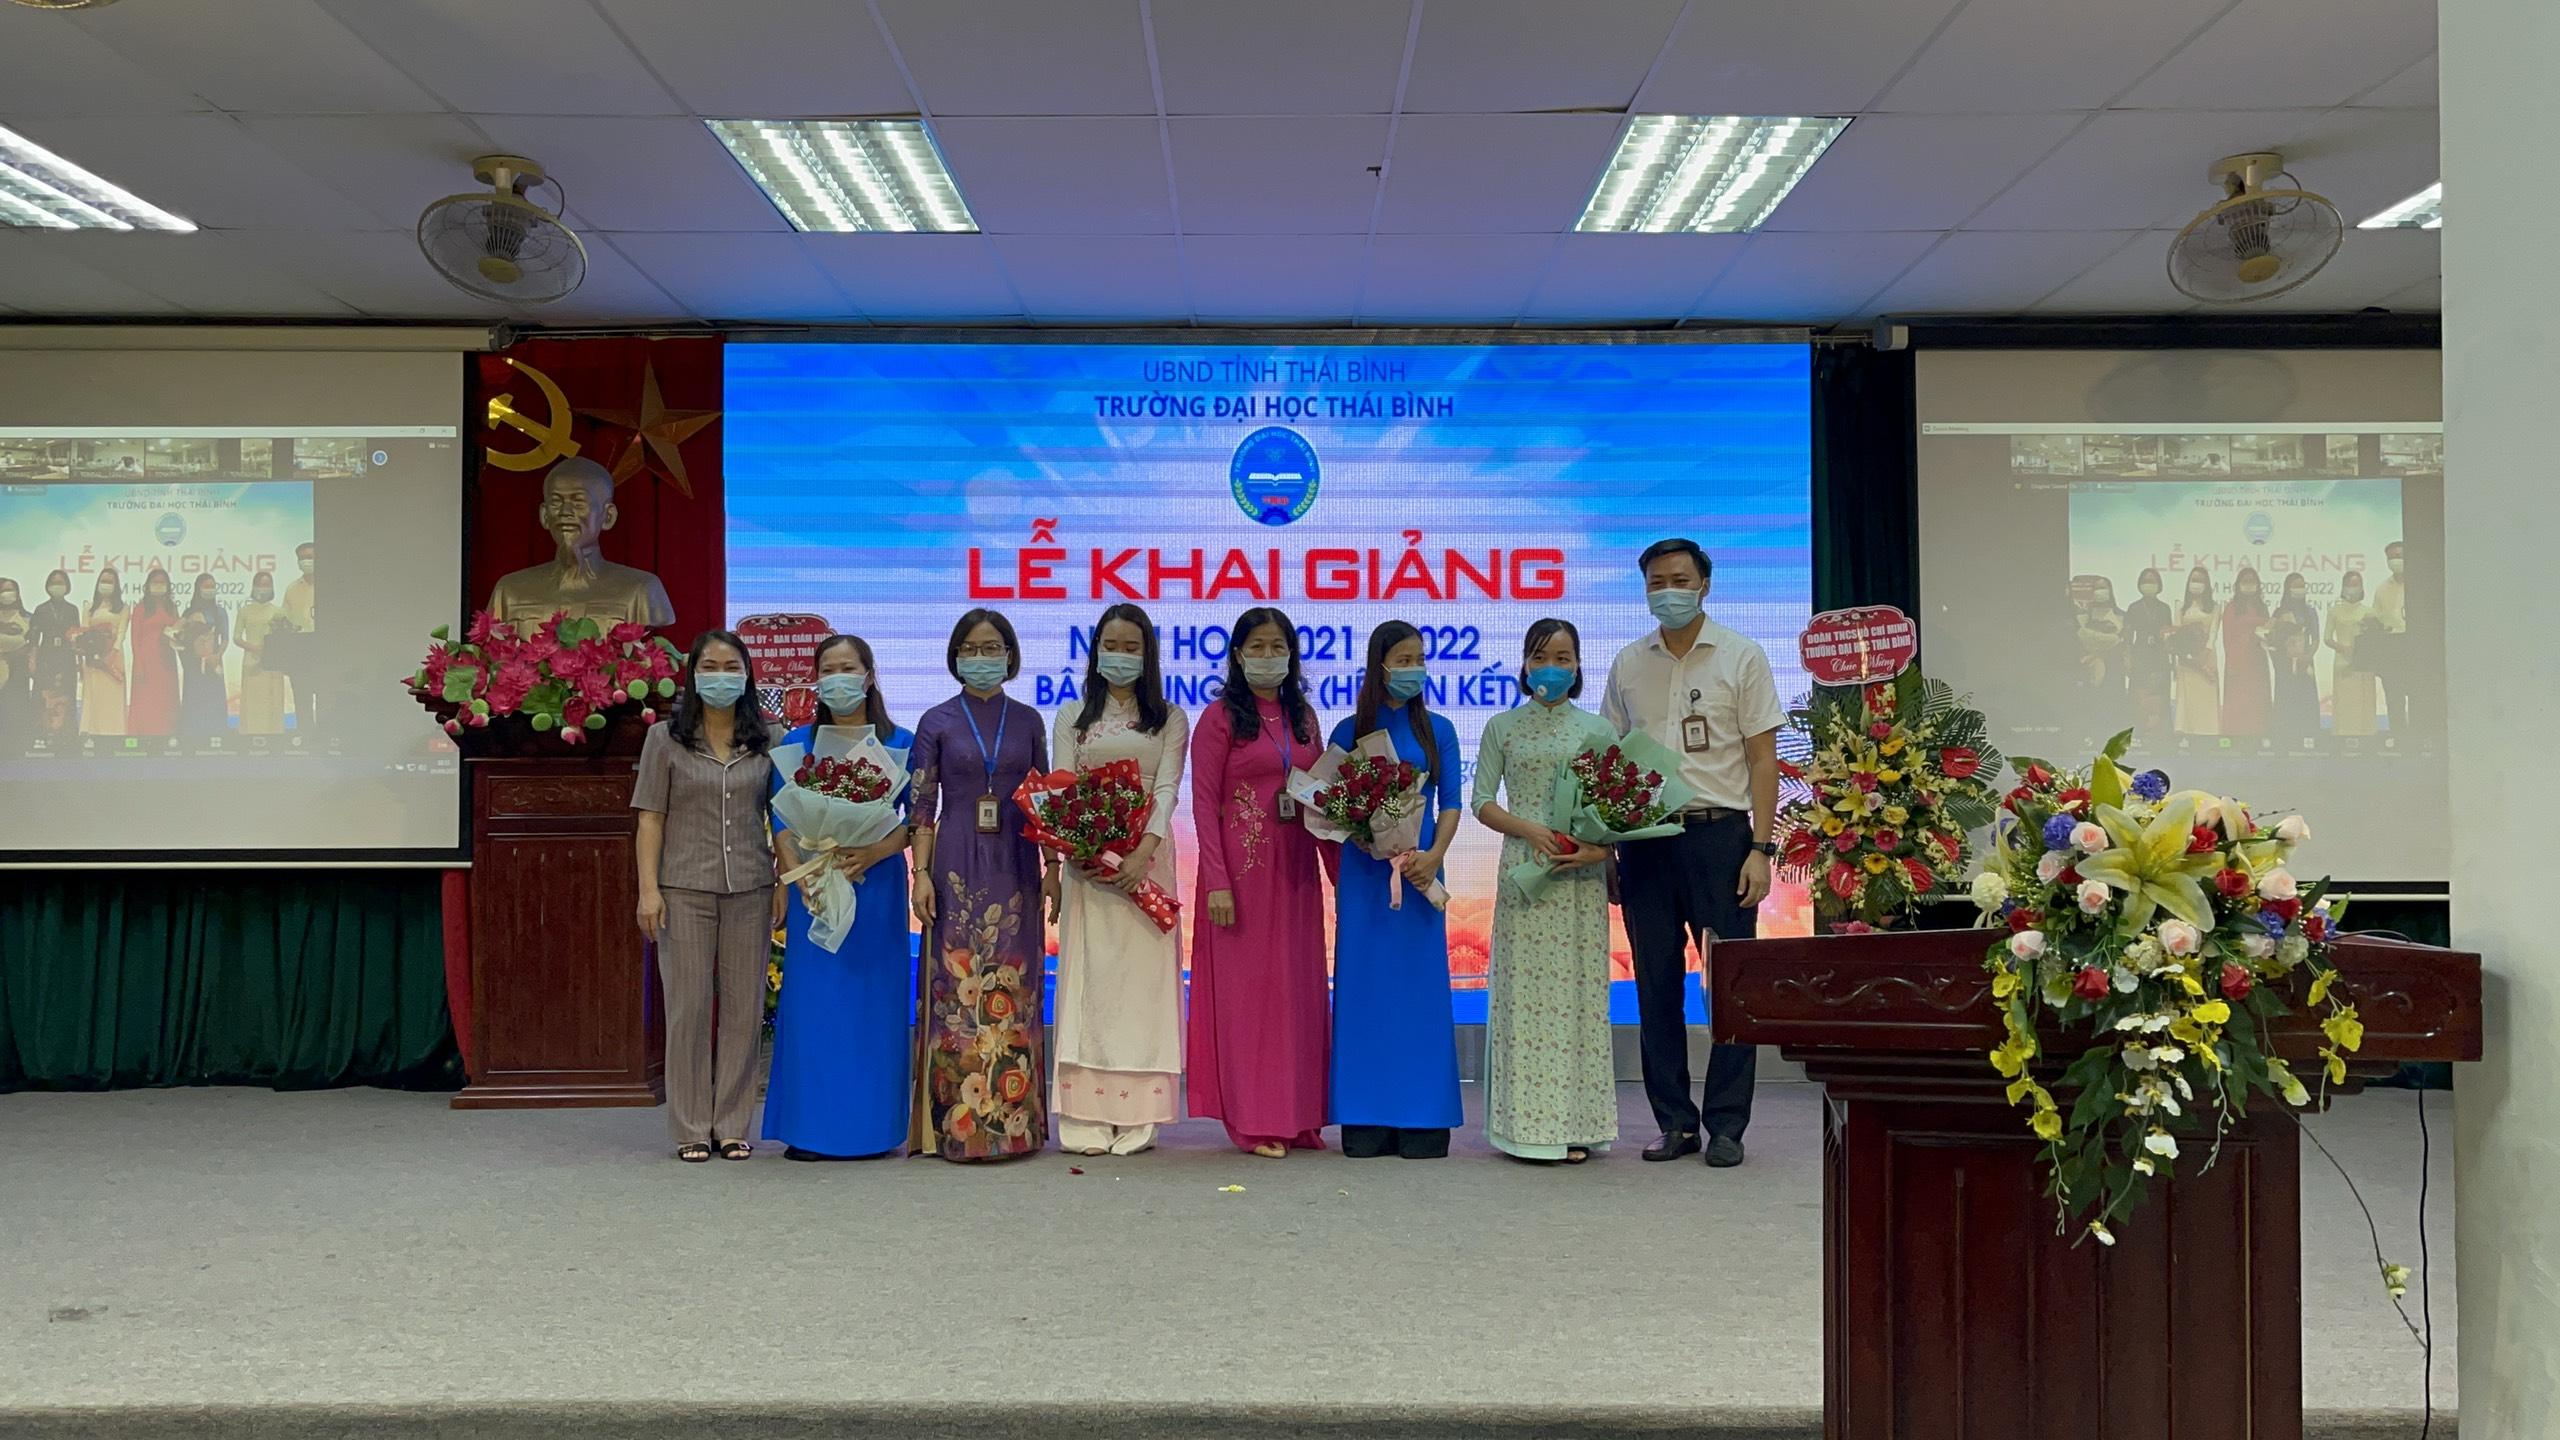 Media/1_TH1062/FolderFunc/202109/Images/khen-thuong-1-20210905090804-e.jpg